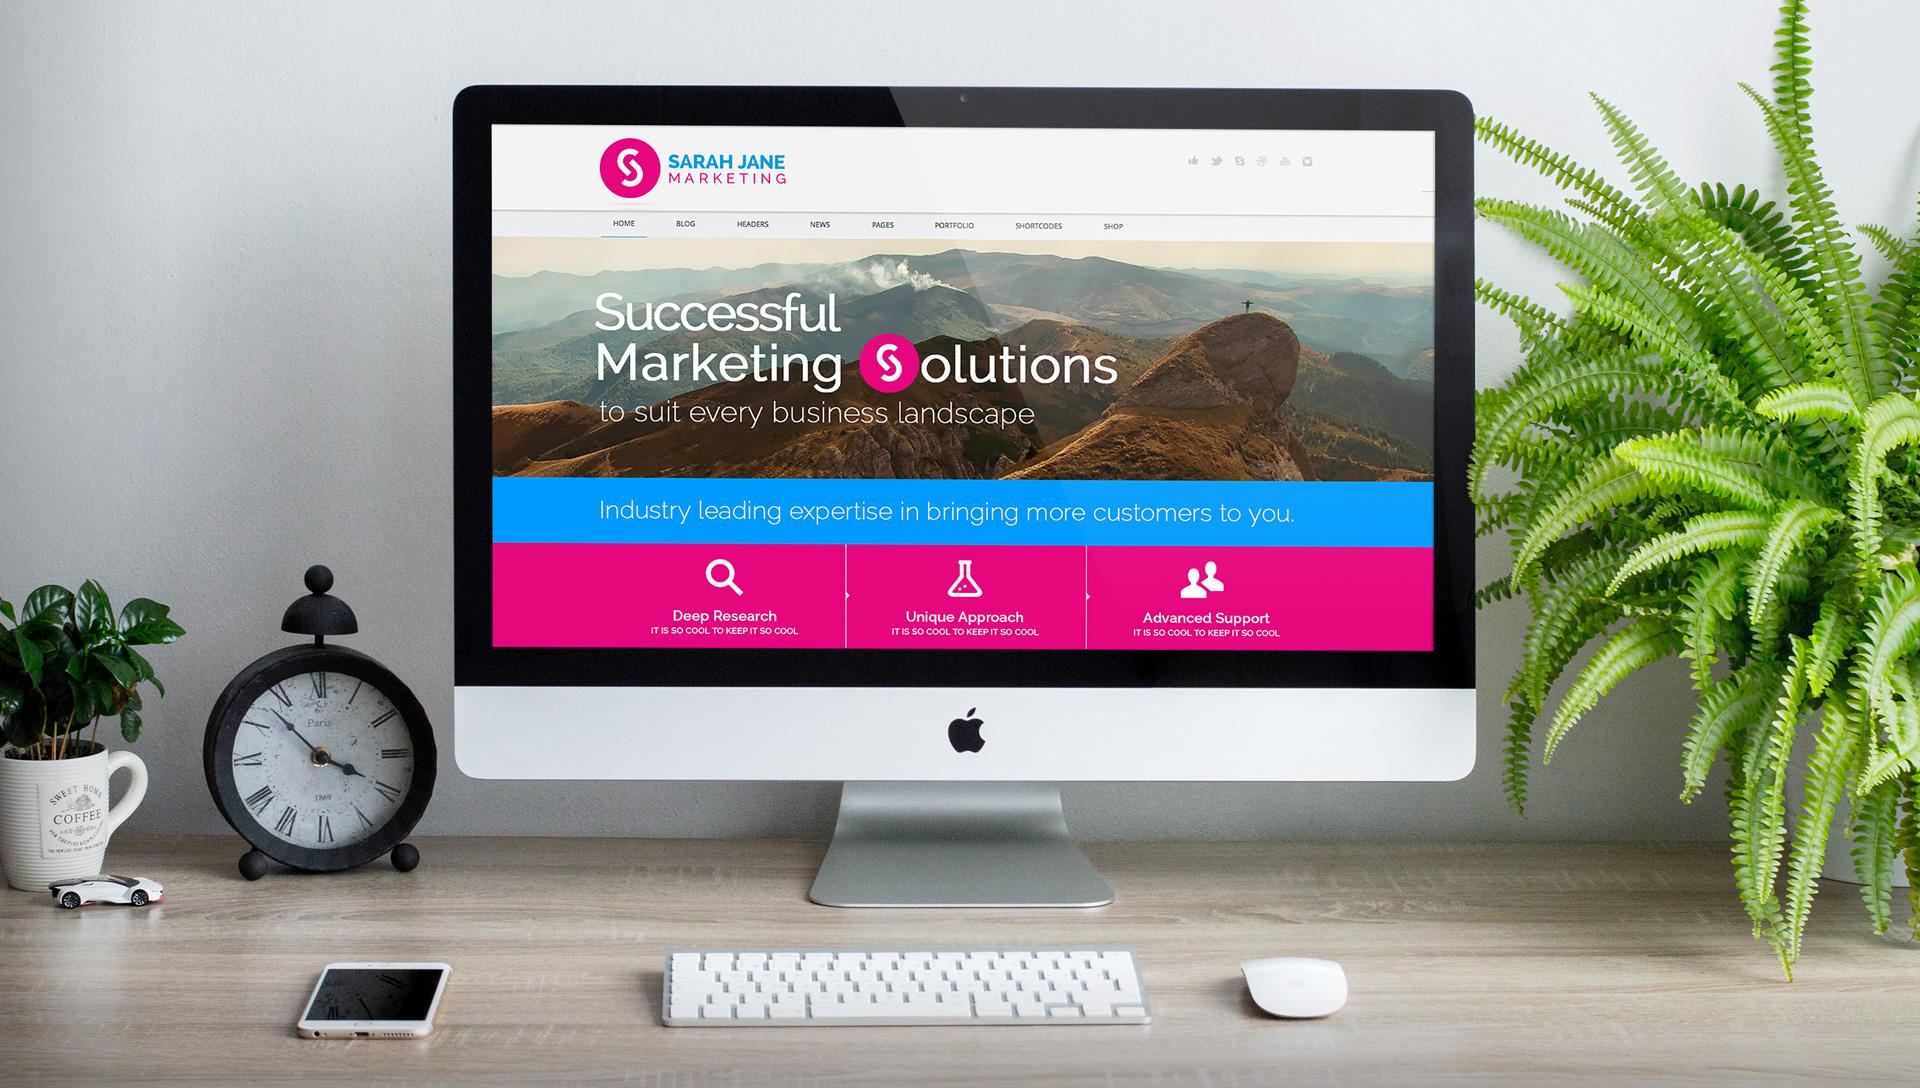 Sarah Jane Marketing - Website Design Mockup